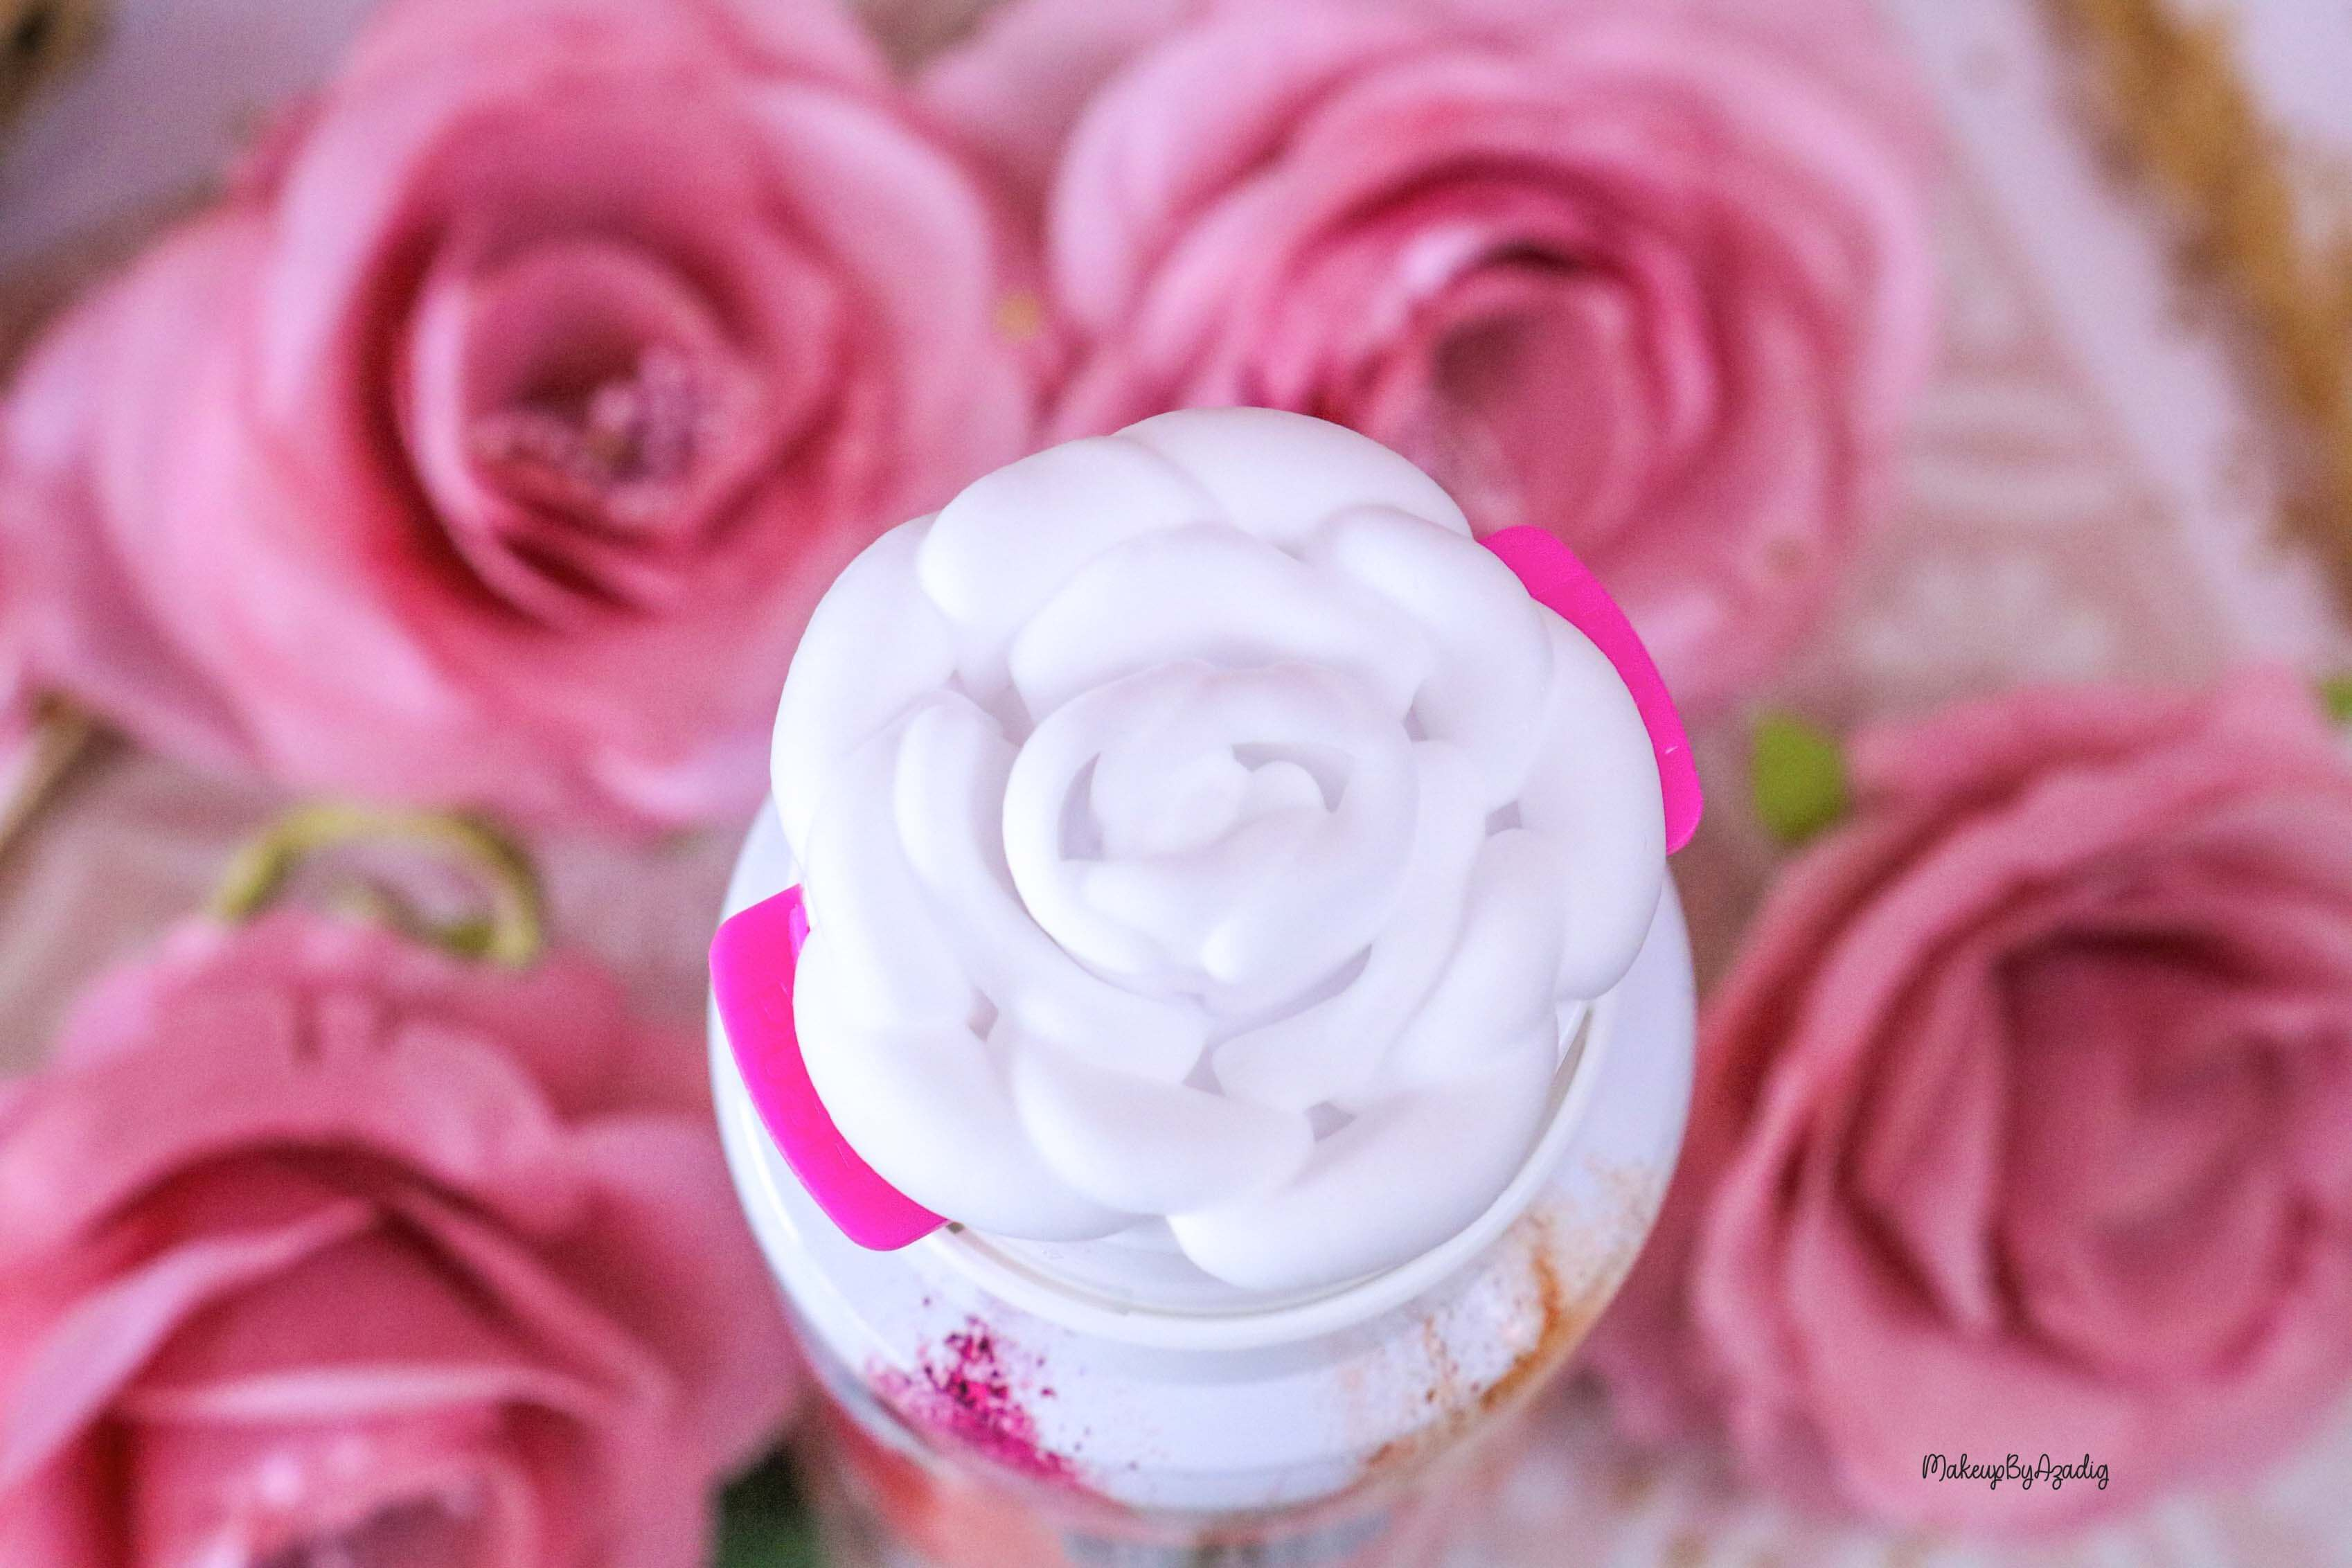 gel-douche-mousse-rituals-shower-flower-foam-ritual-hoi-makeupbyazadig-avis-prix-sephora-france-rose